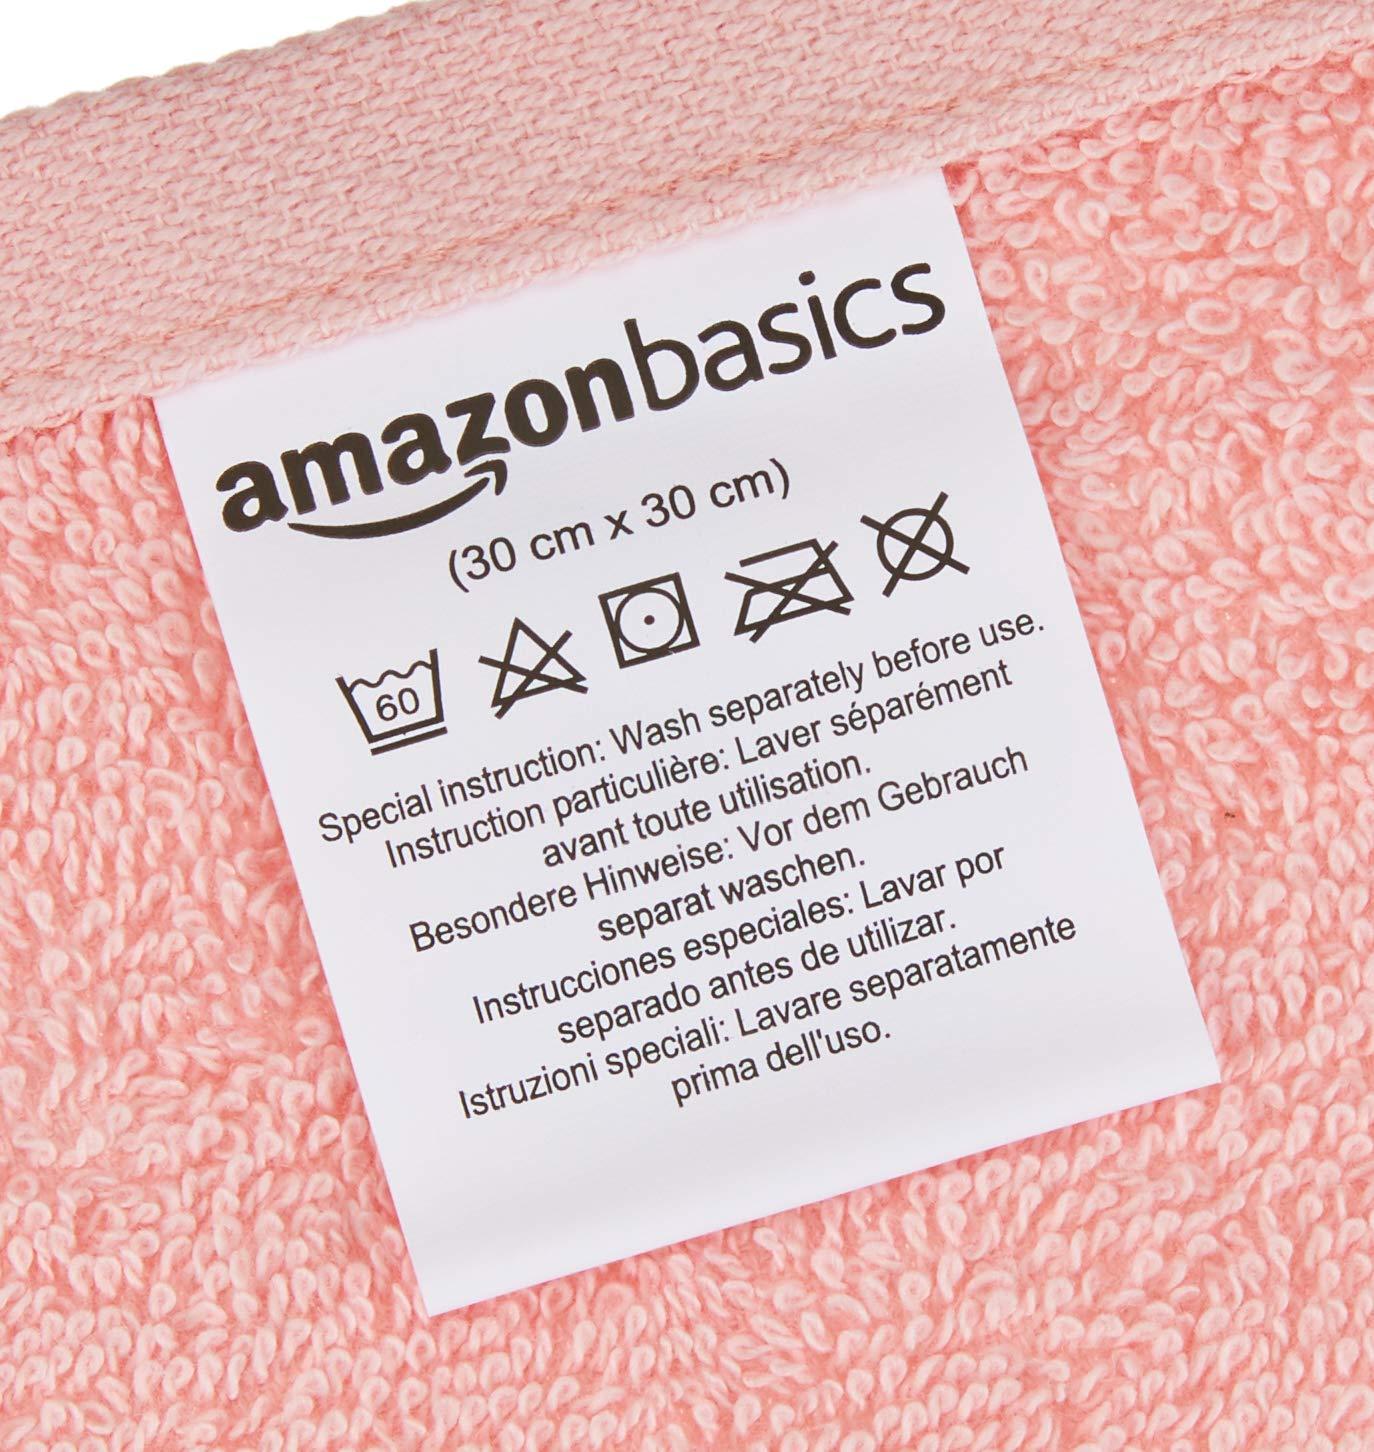 AmazonBasics - Toallas de algodón, 12 unidades, Rosa pétalo, Lavanda, Blanco: Amazon.es: Hogar